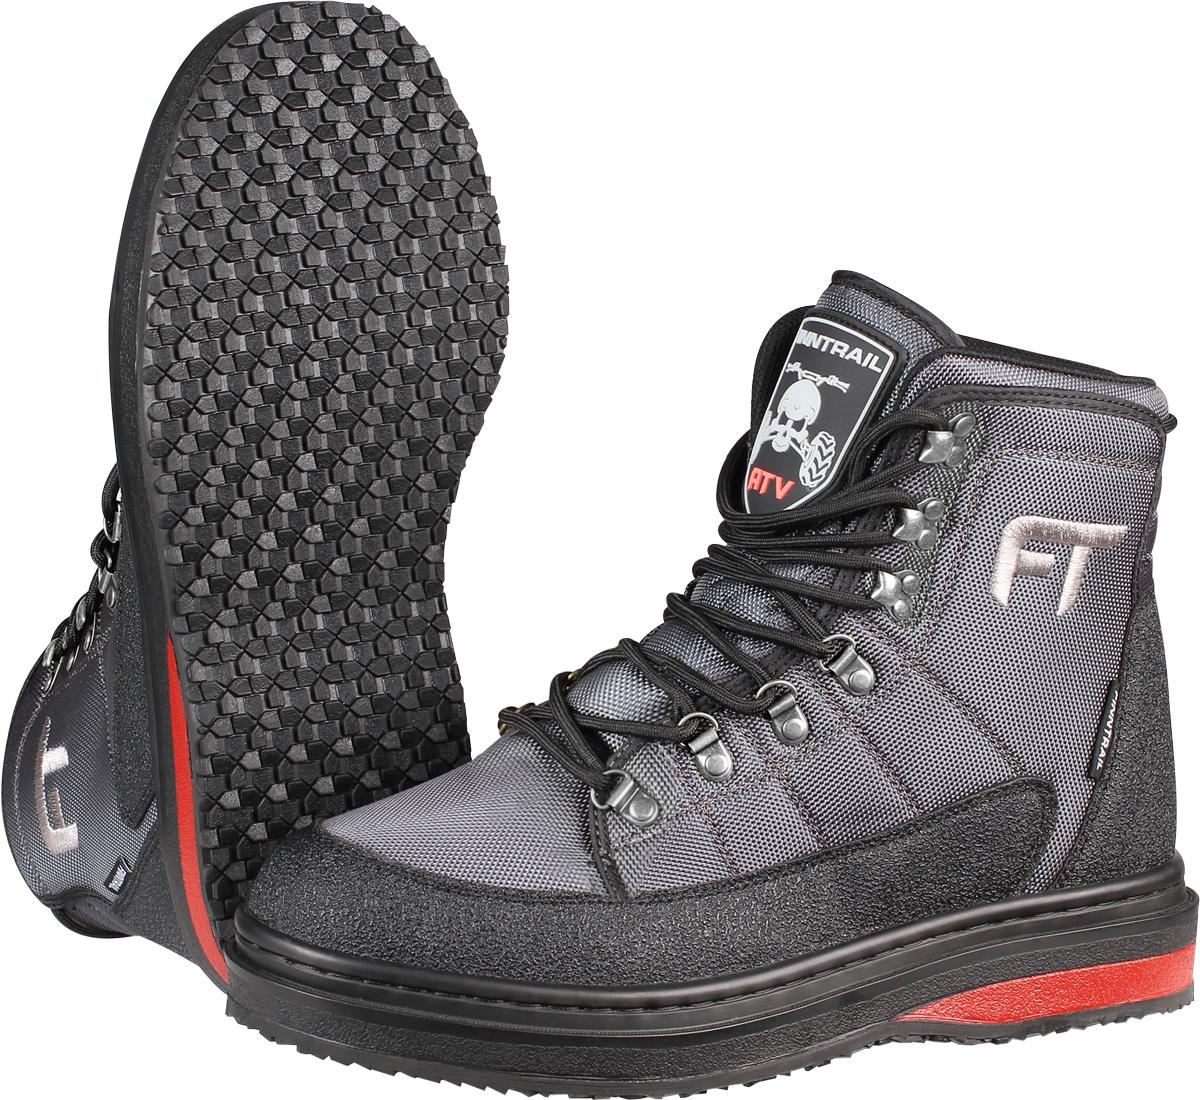 Ботинки для рыбалки Finntrail Runner, цвет: серый, черный, красный. 5221. Размер 42